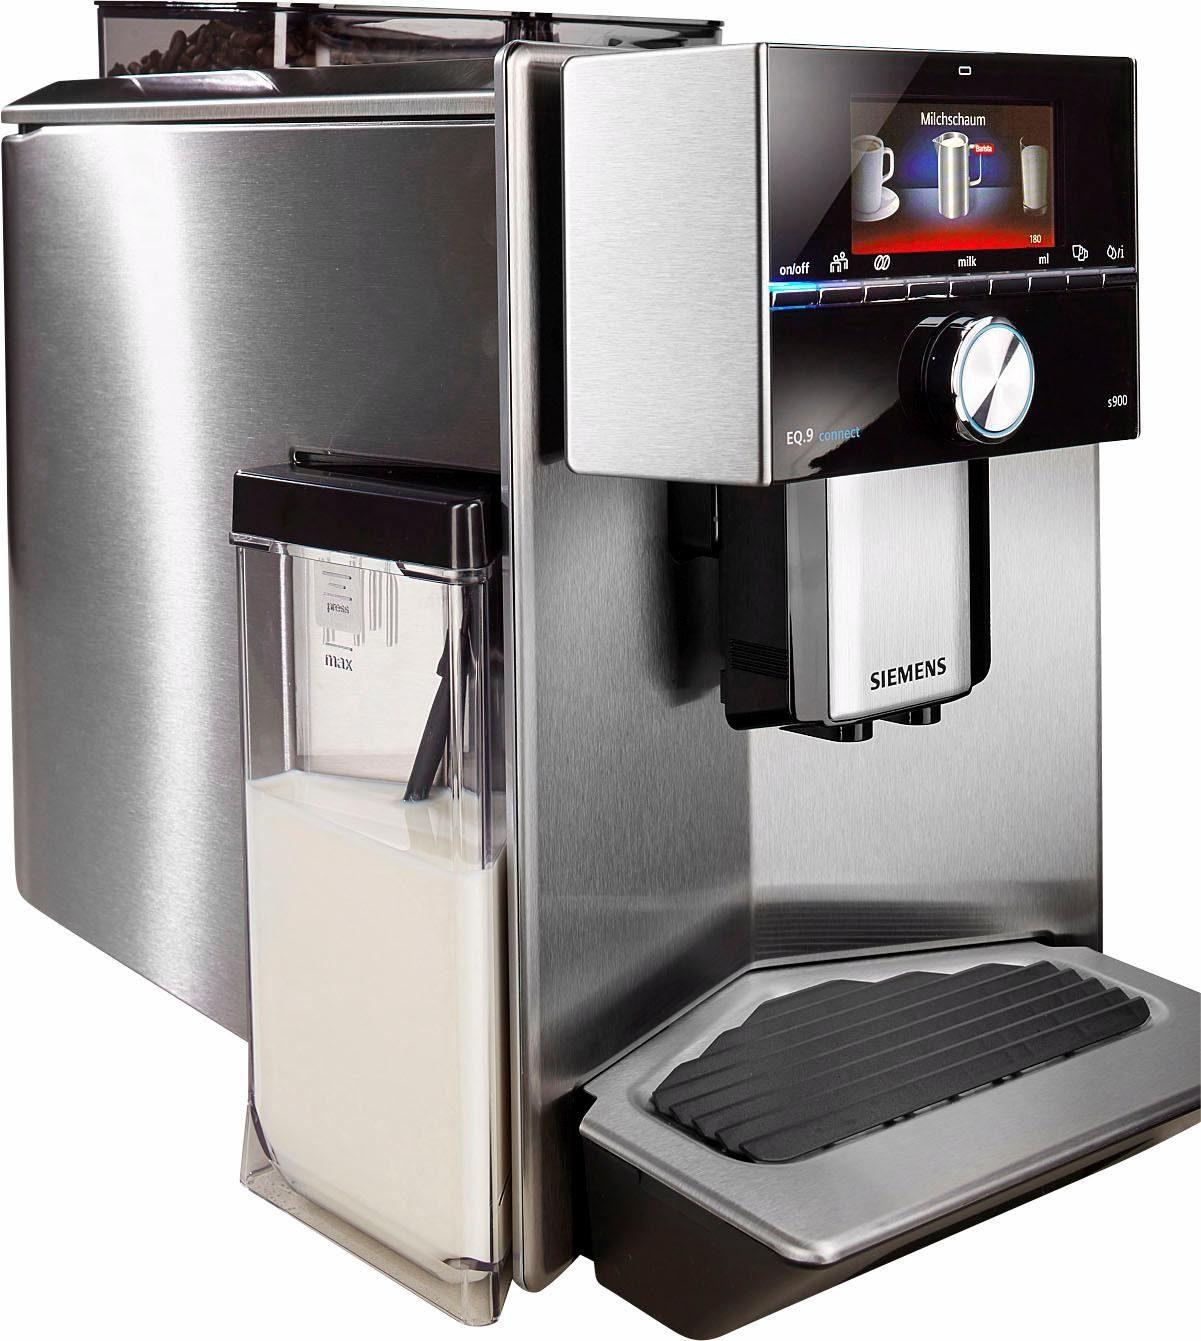 Siemens Kaffeevollautomat EQ.9 connect s900 TI909701HC, integrierter Milchtank